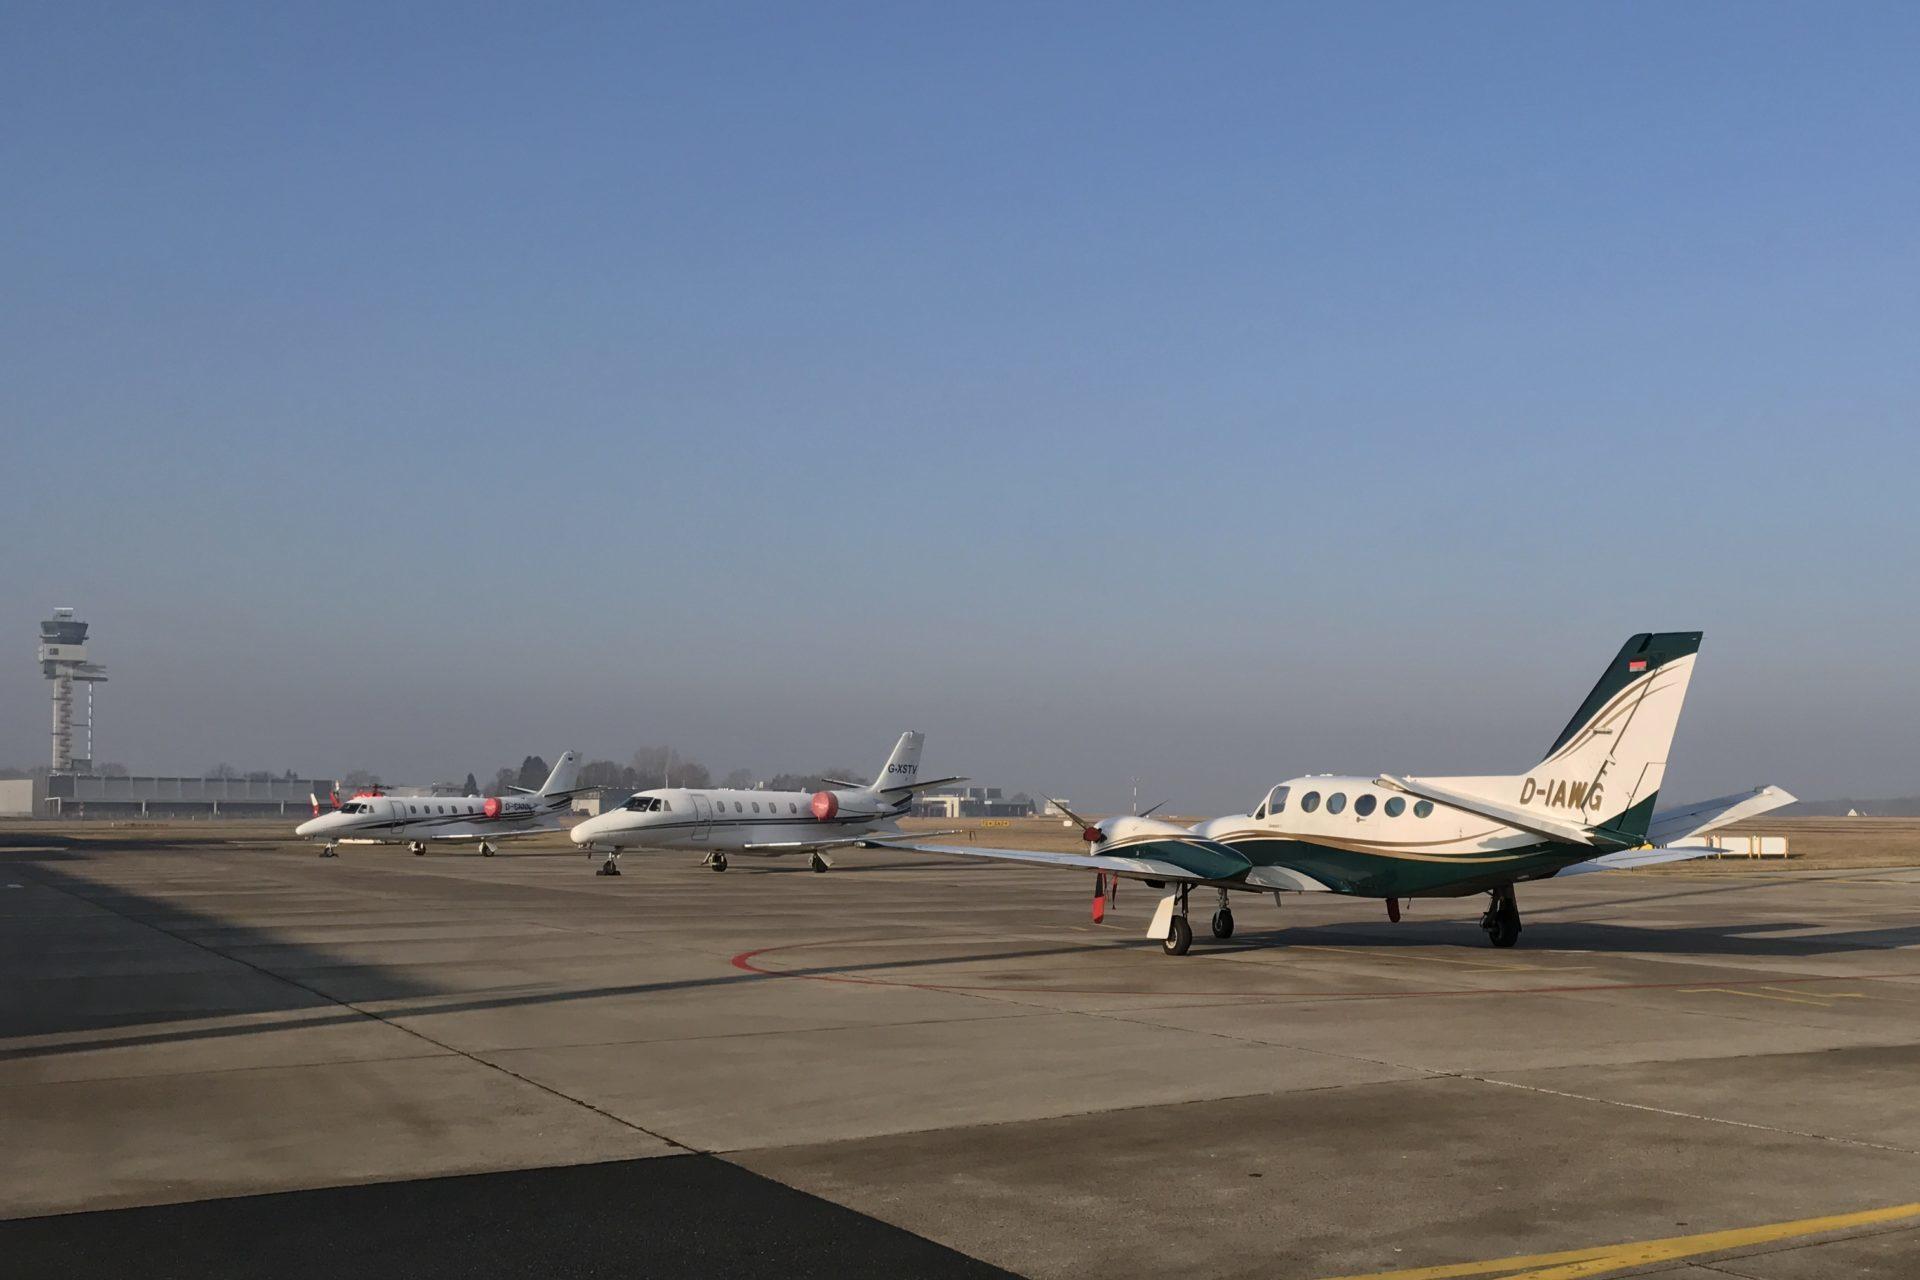 Flughafen Hannover Langenhagen Abflug und Ankunft